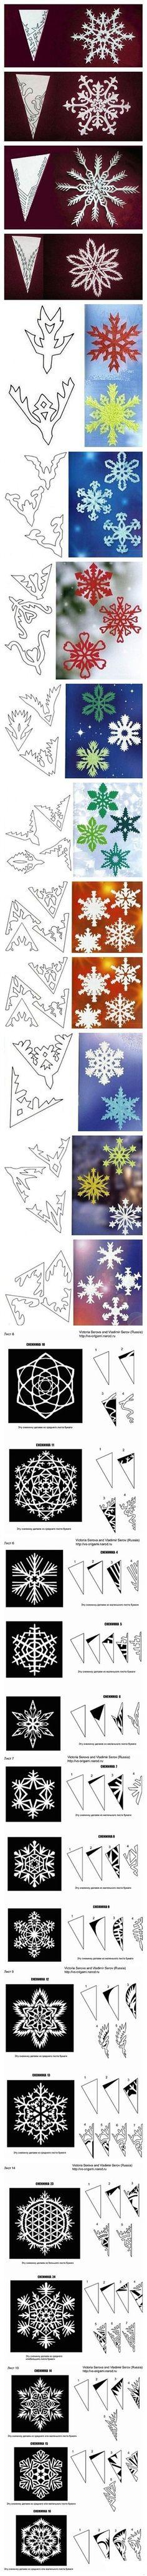 snowflake by Jemchi